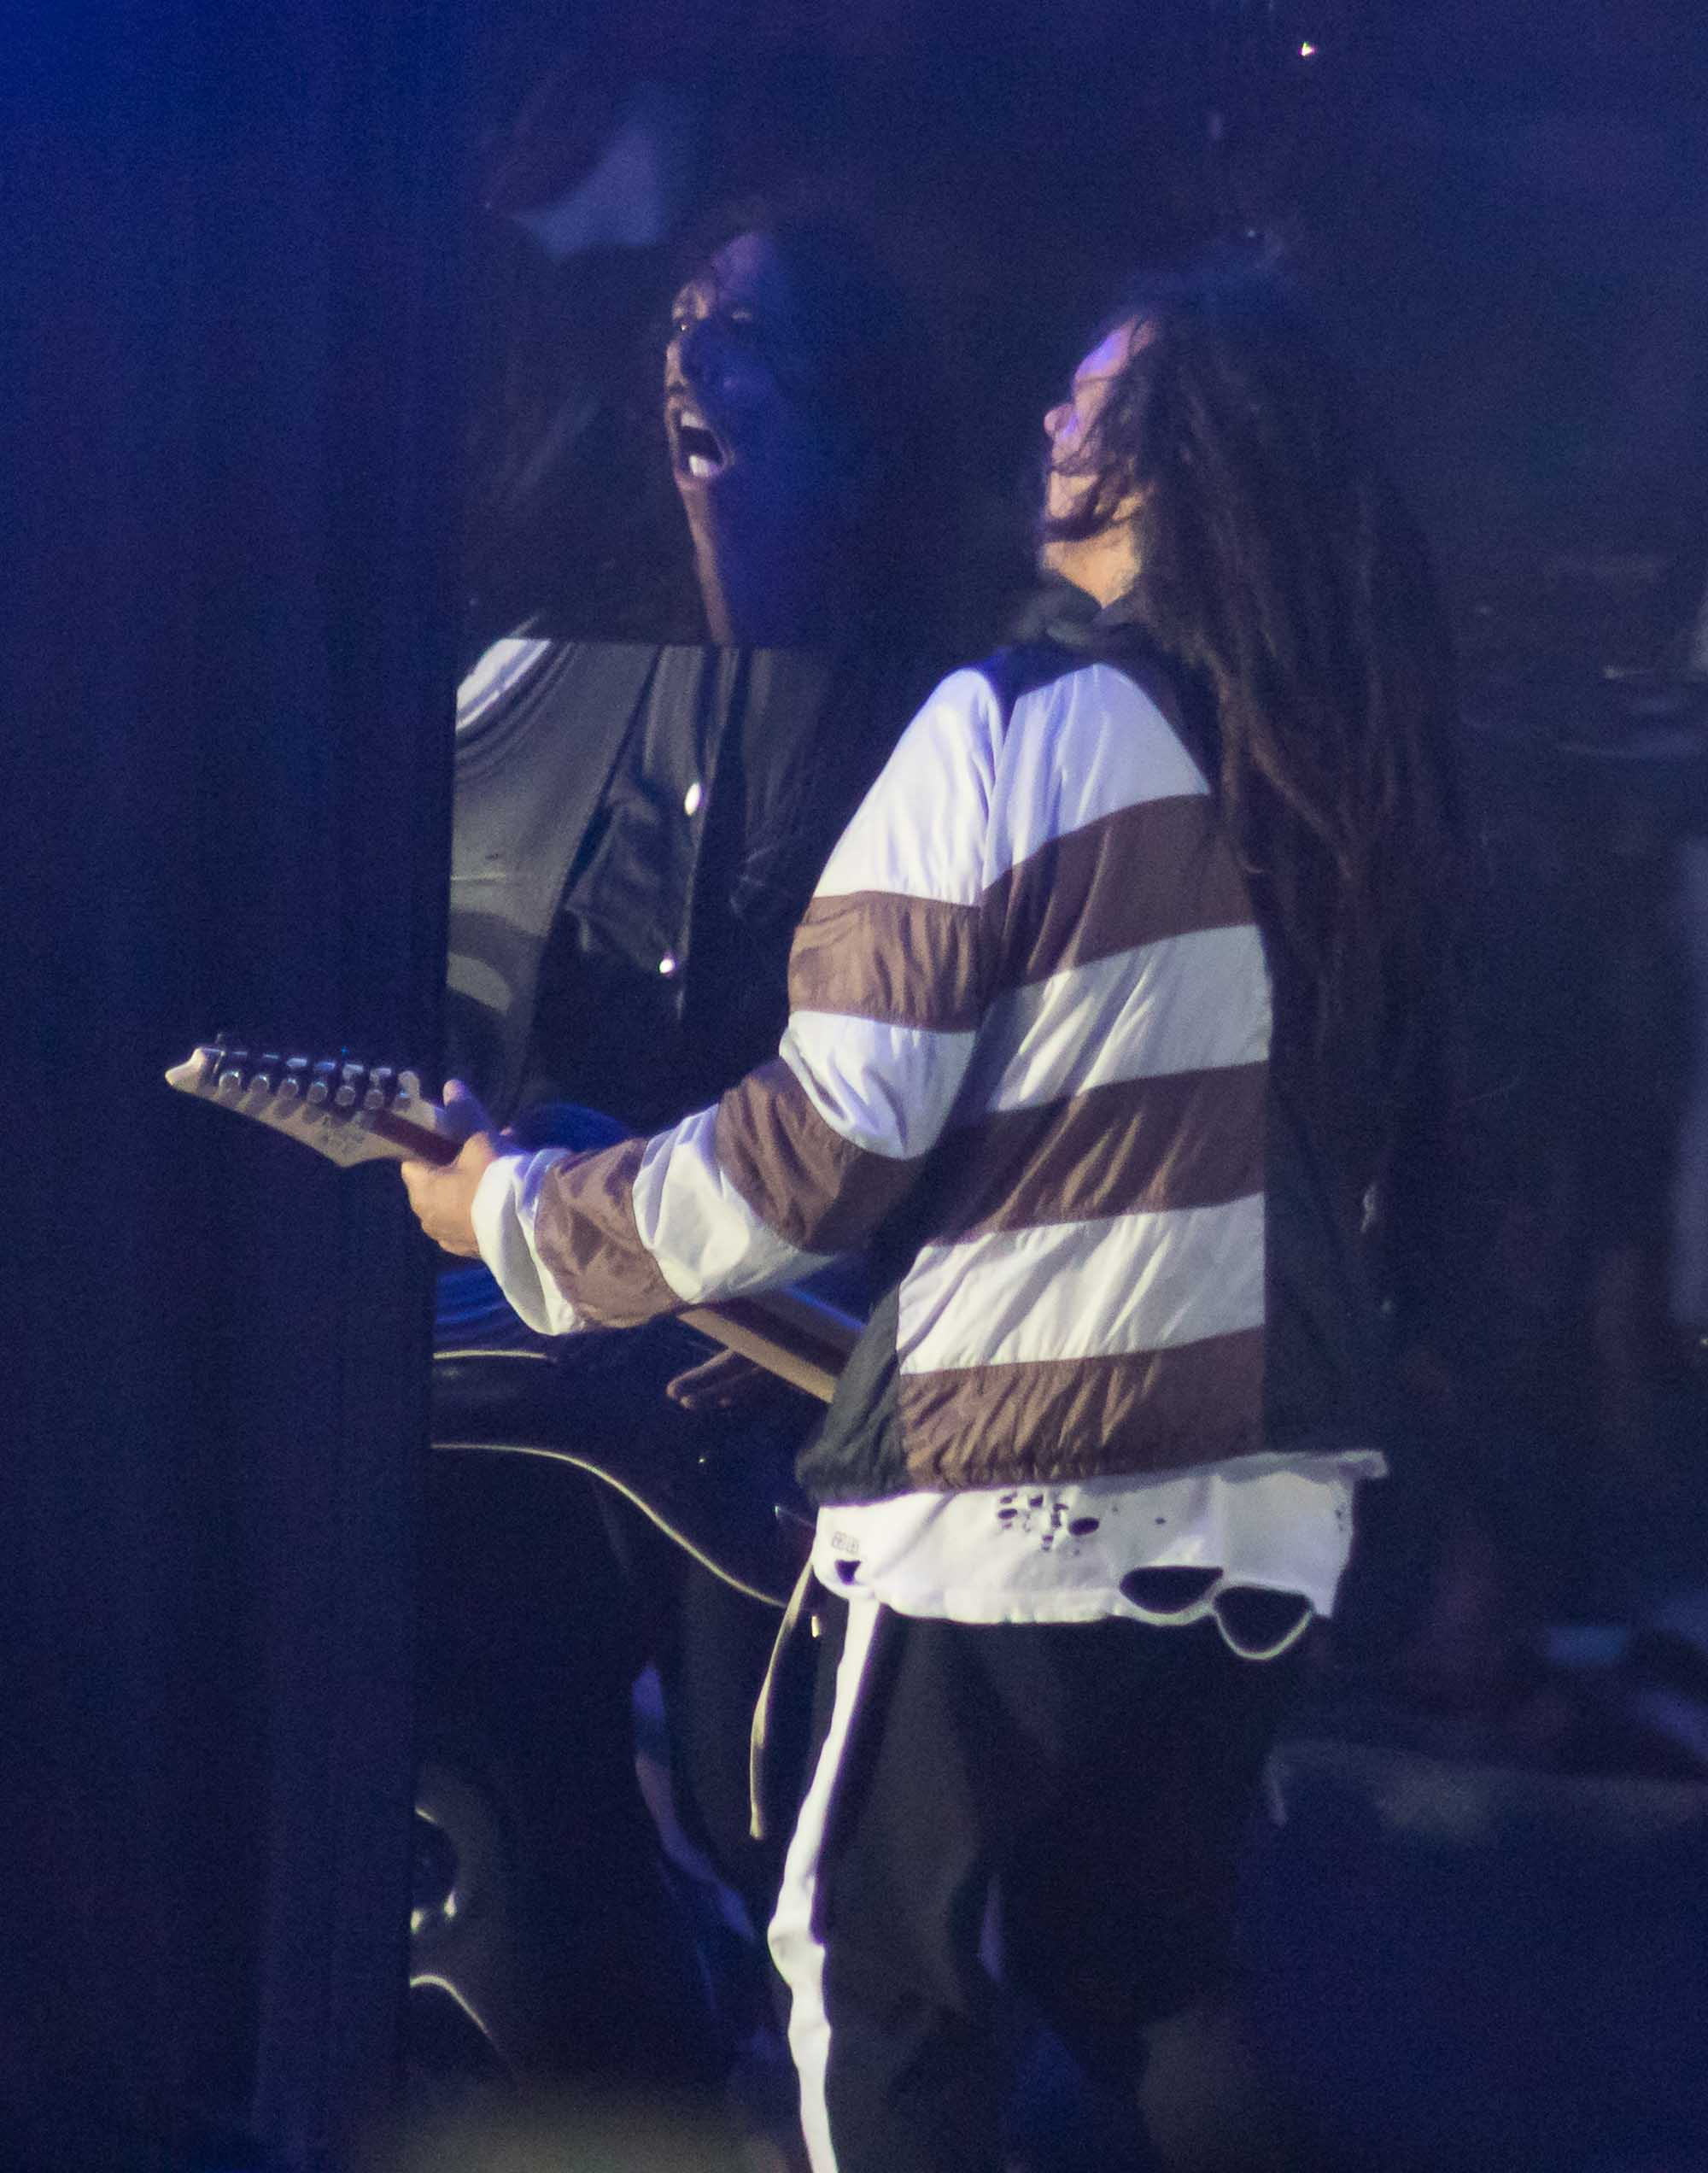 Korn-BudweiserStage-Toronto_Ontario-20190814-JeremyGretzinger22